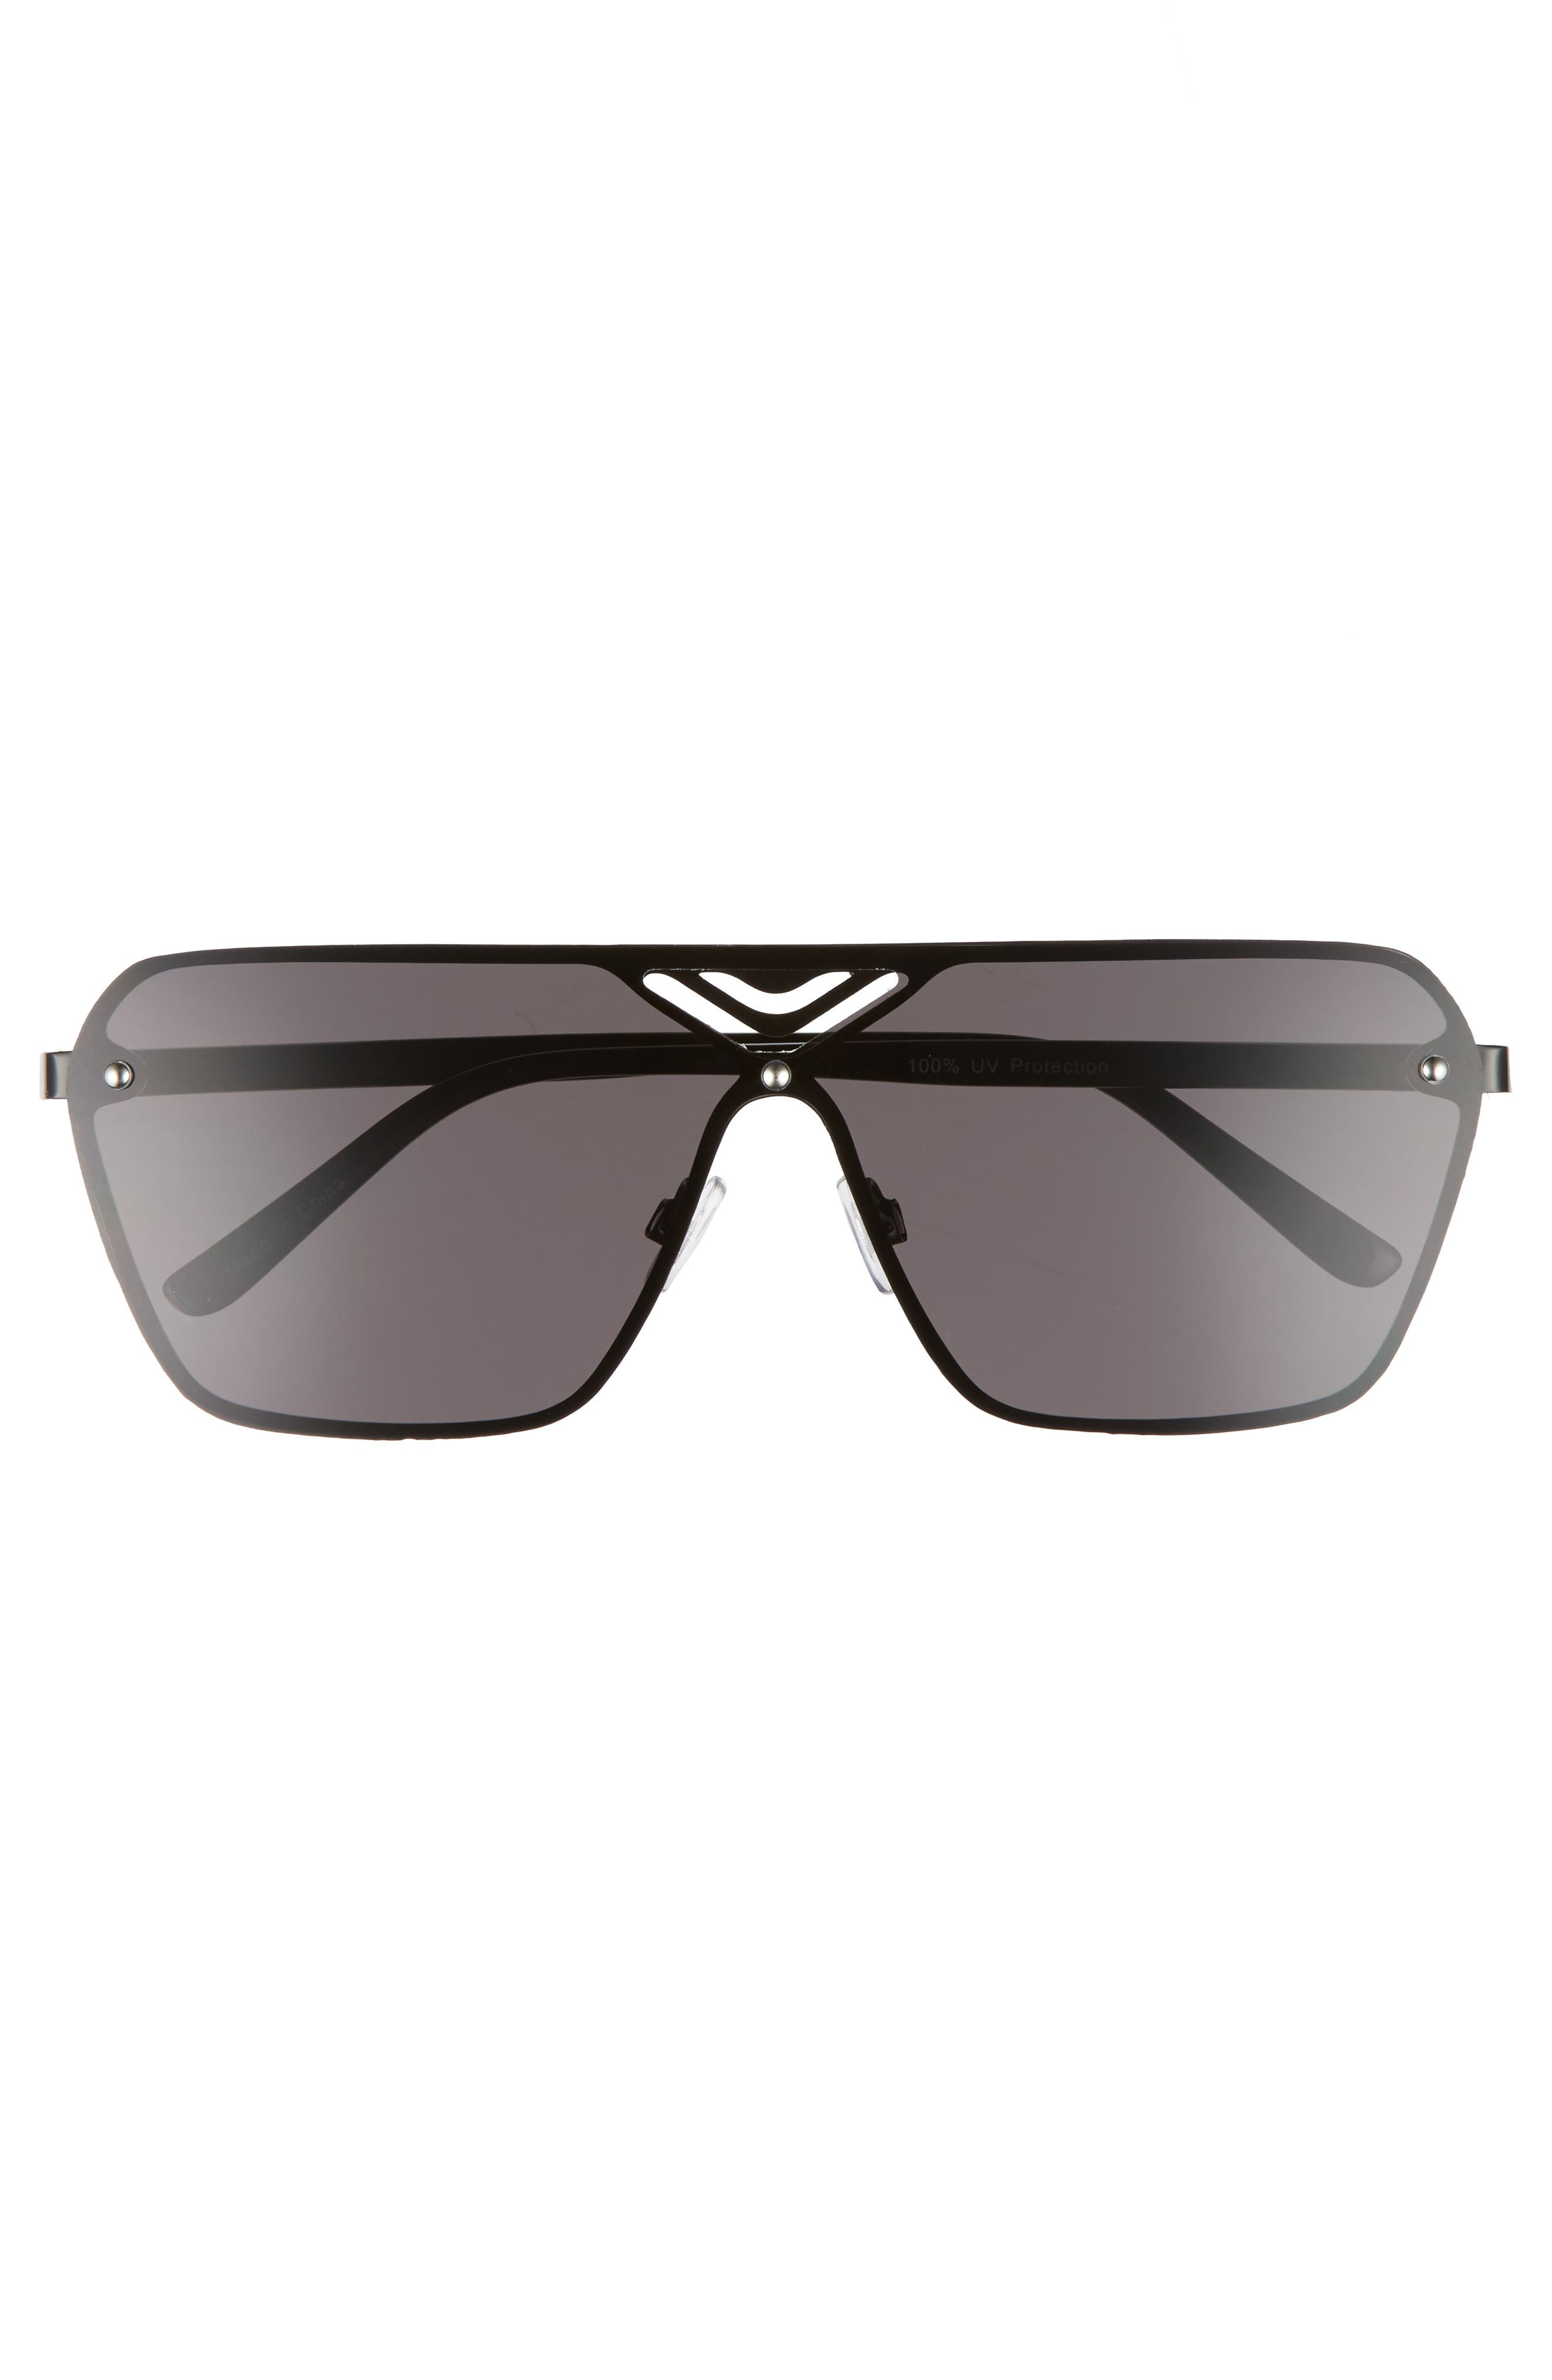 70mm Cutout Shield Sunglasses,                             Alternate thumbnail 3, color,                             001